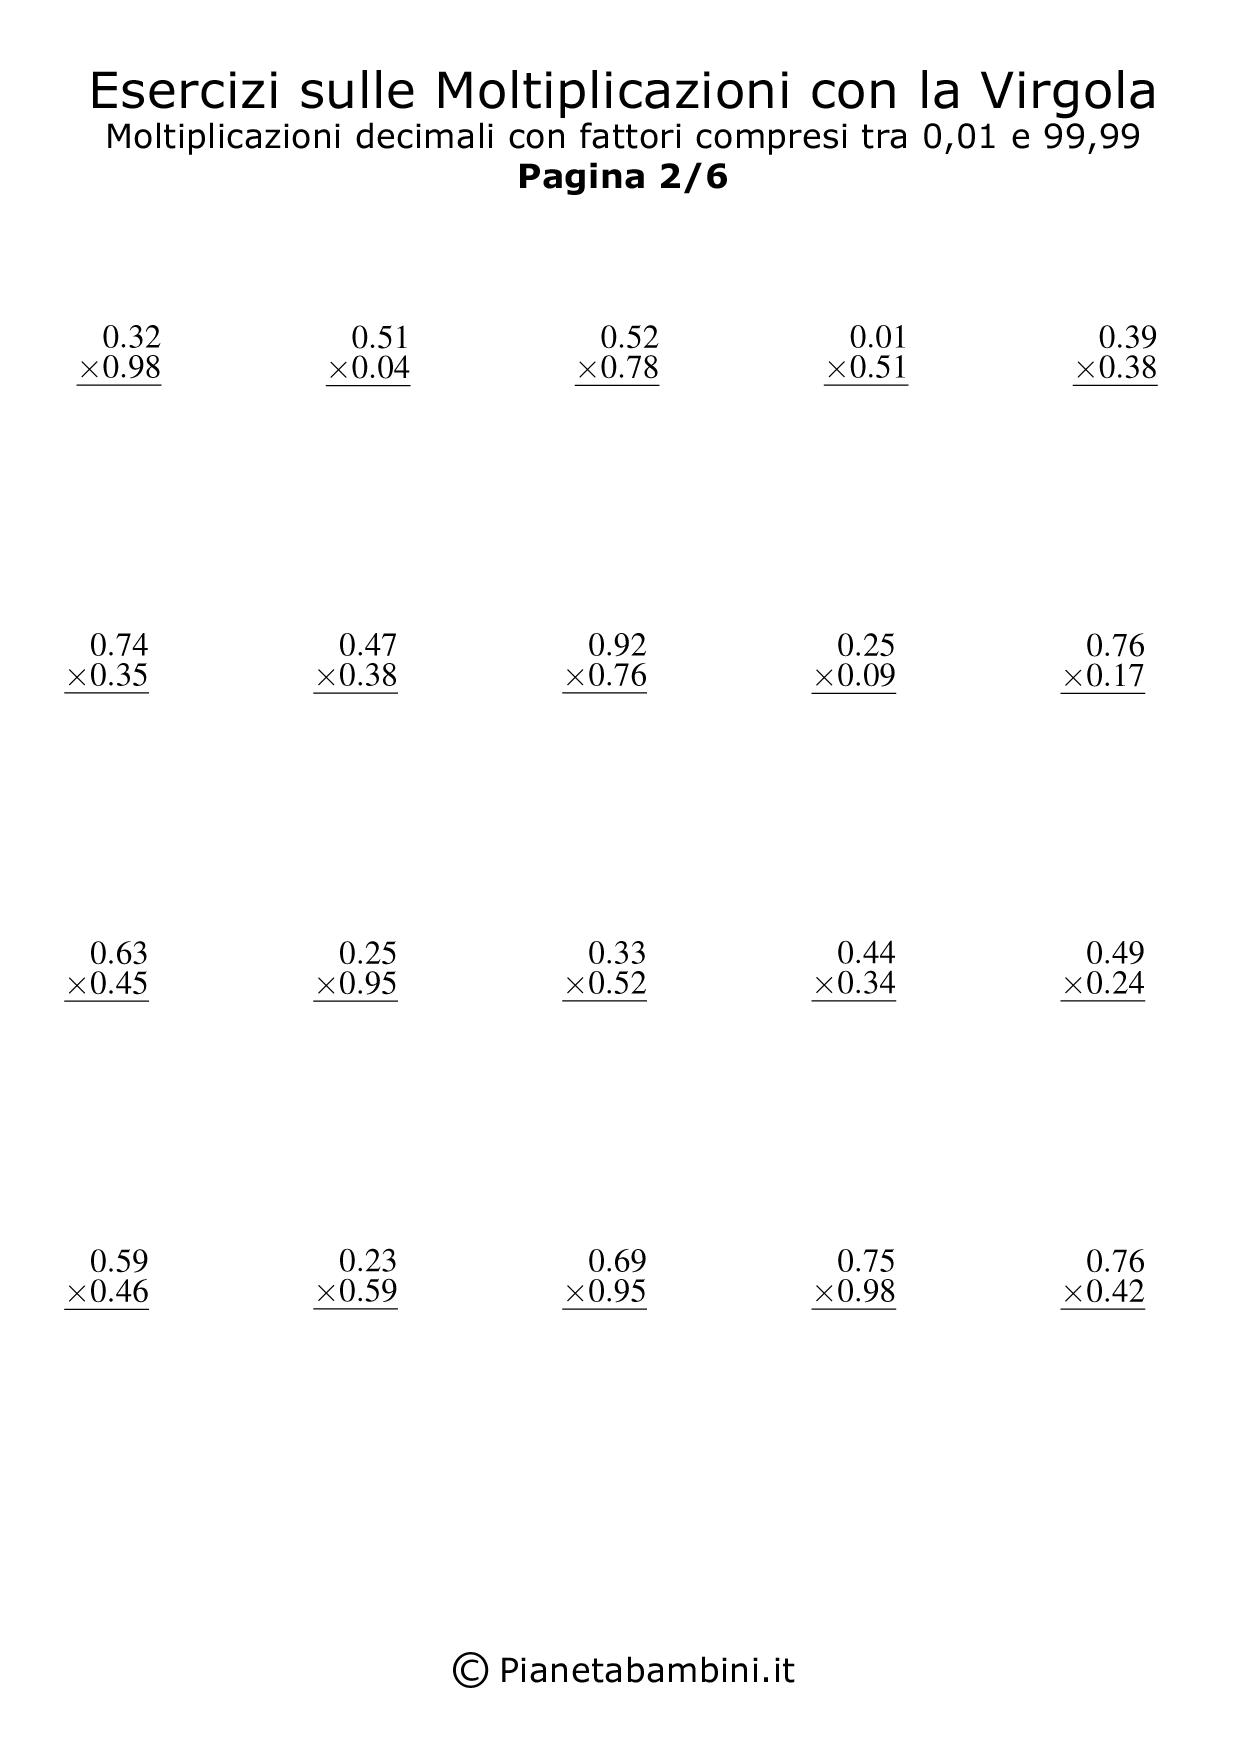 Moltiplicazioni-Virgola-0.01-99.99_2